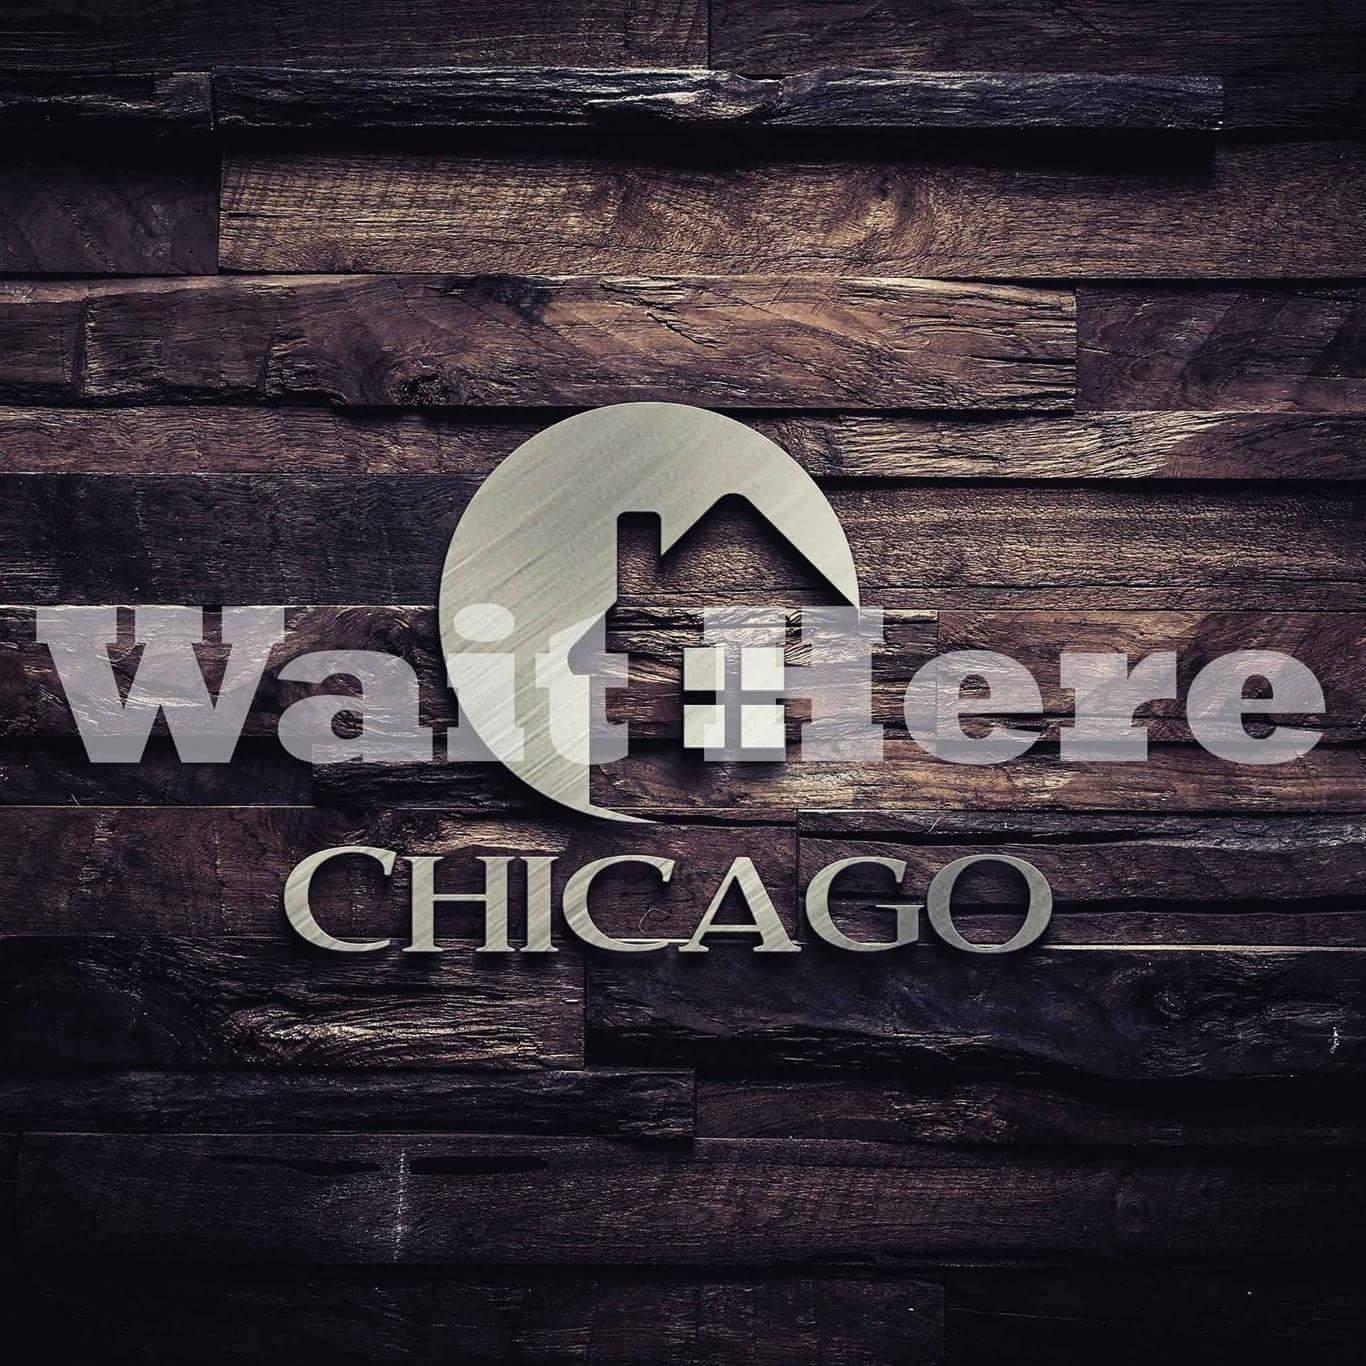 Wait Here Chicago - Luggage Storage & Layover Concierge